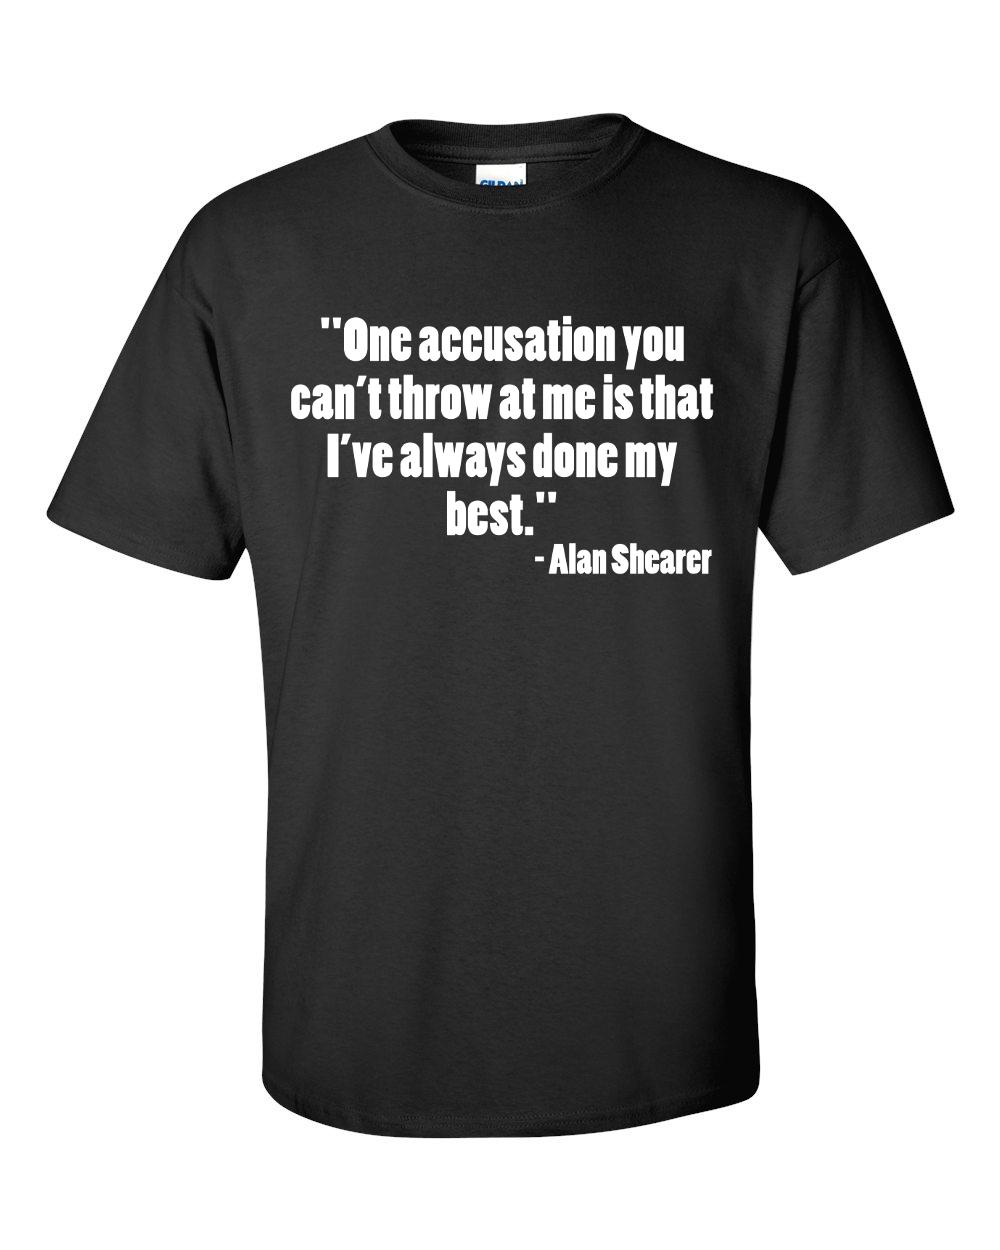 Alan Shearer's quote #7